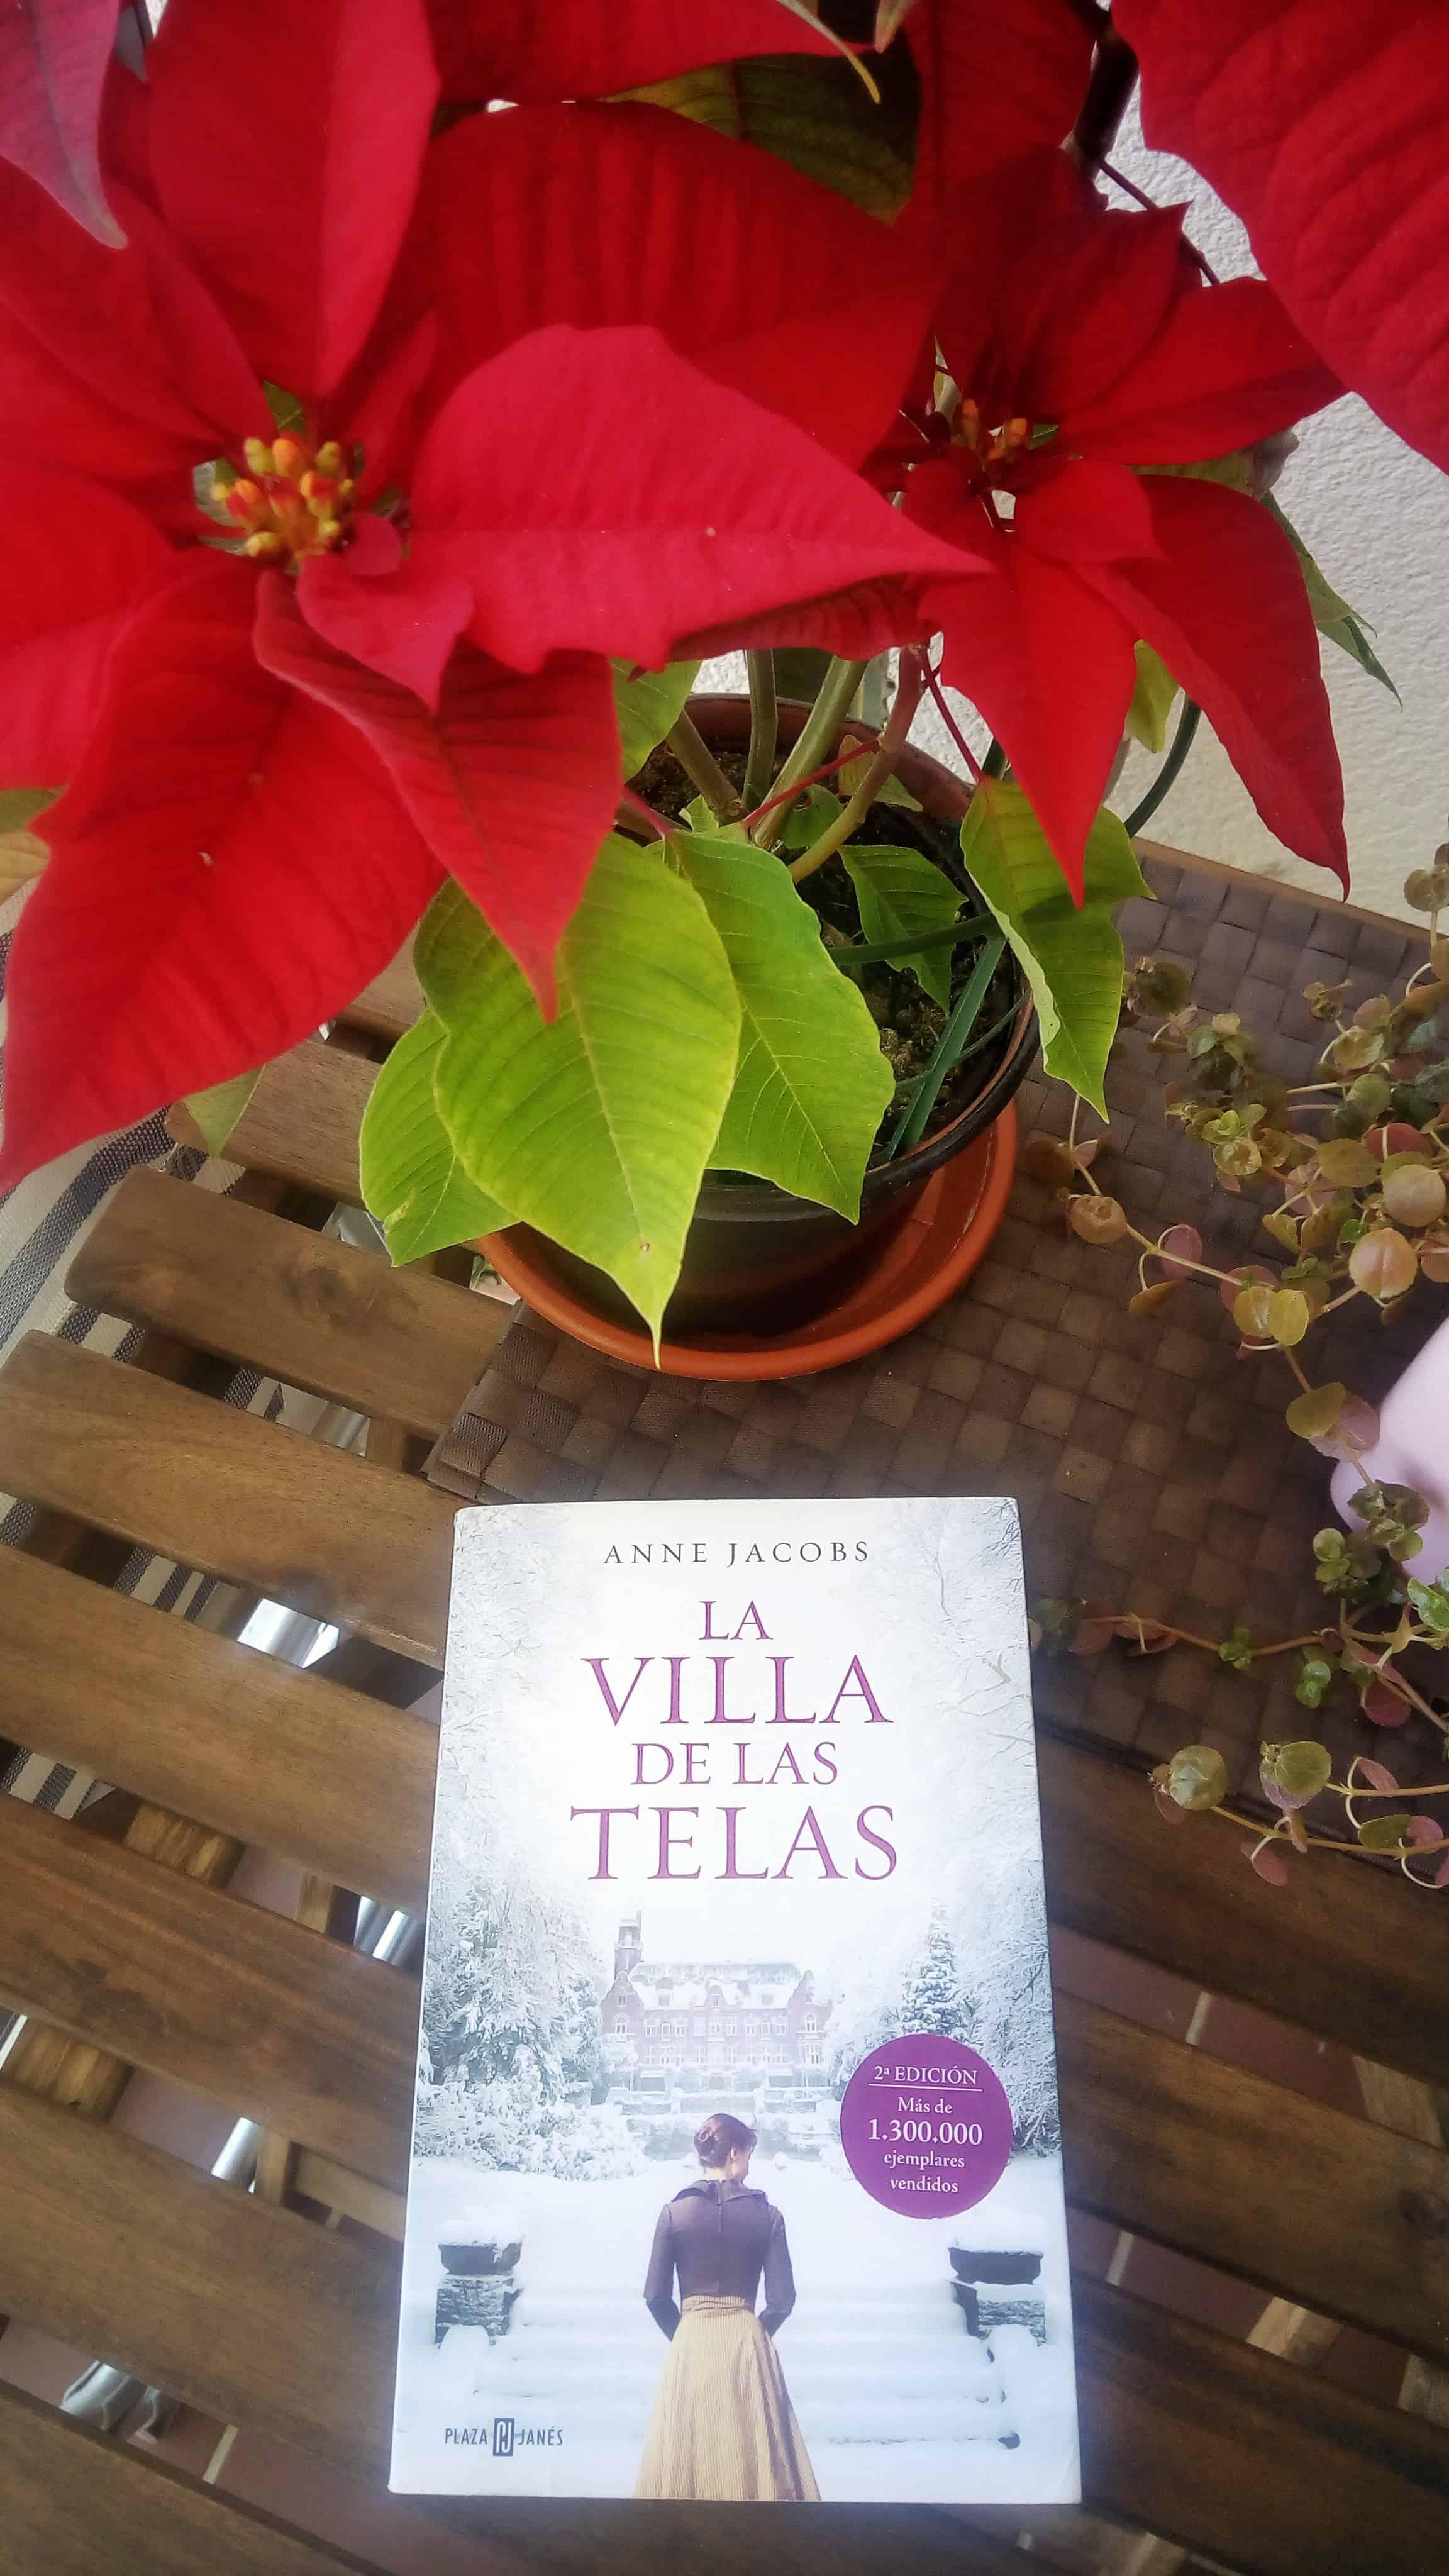 LA VILLA DE LAS TELAS, de Anne Jacobs.